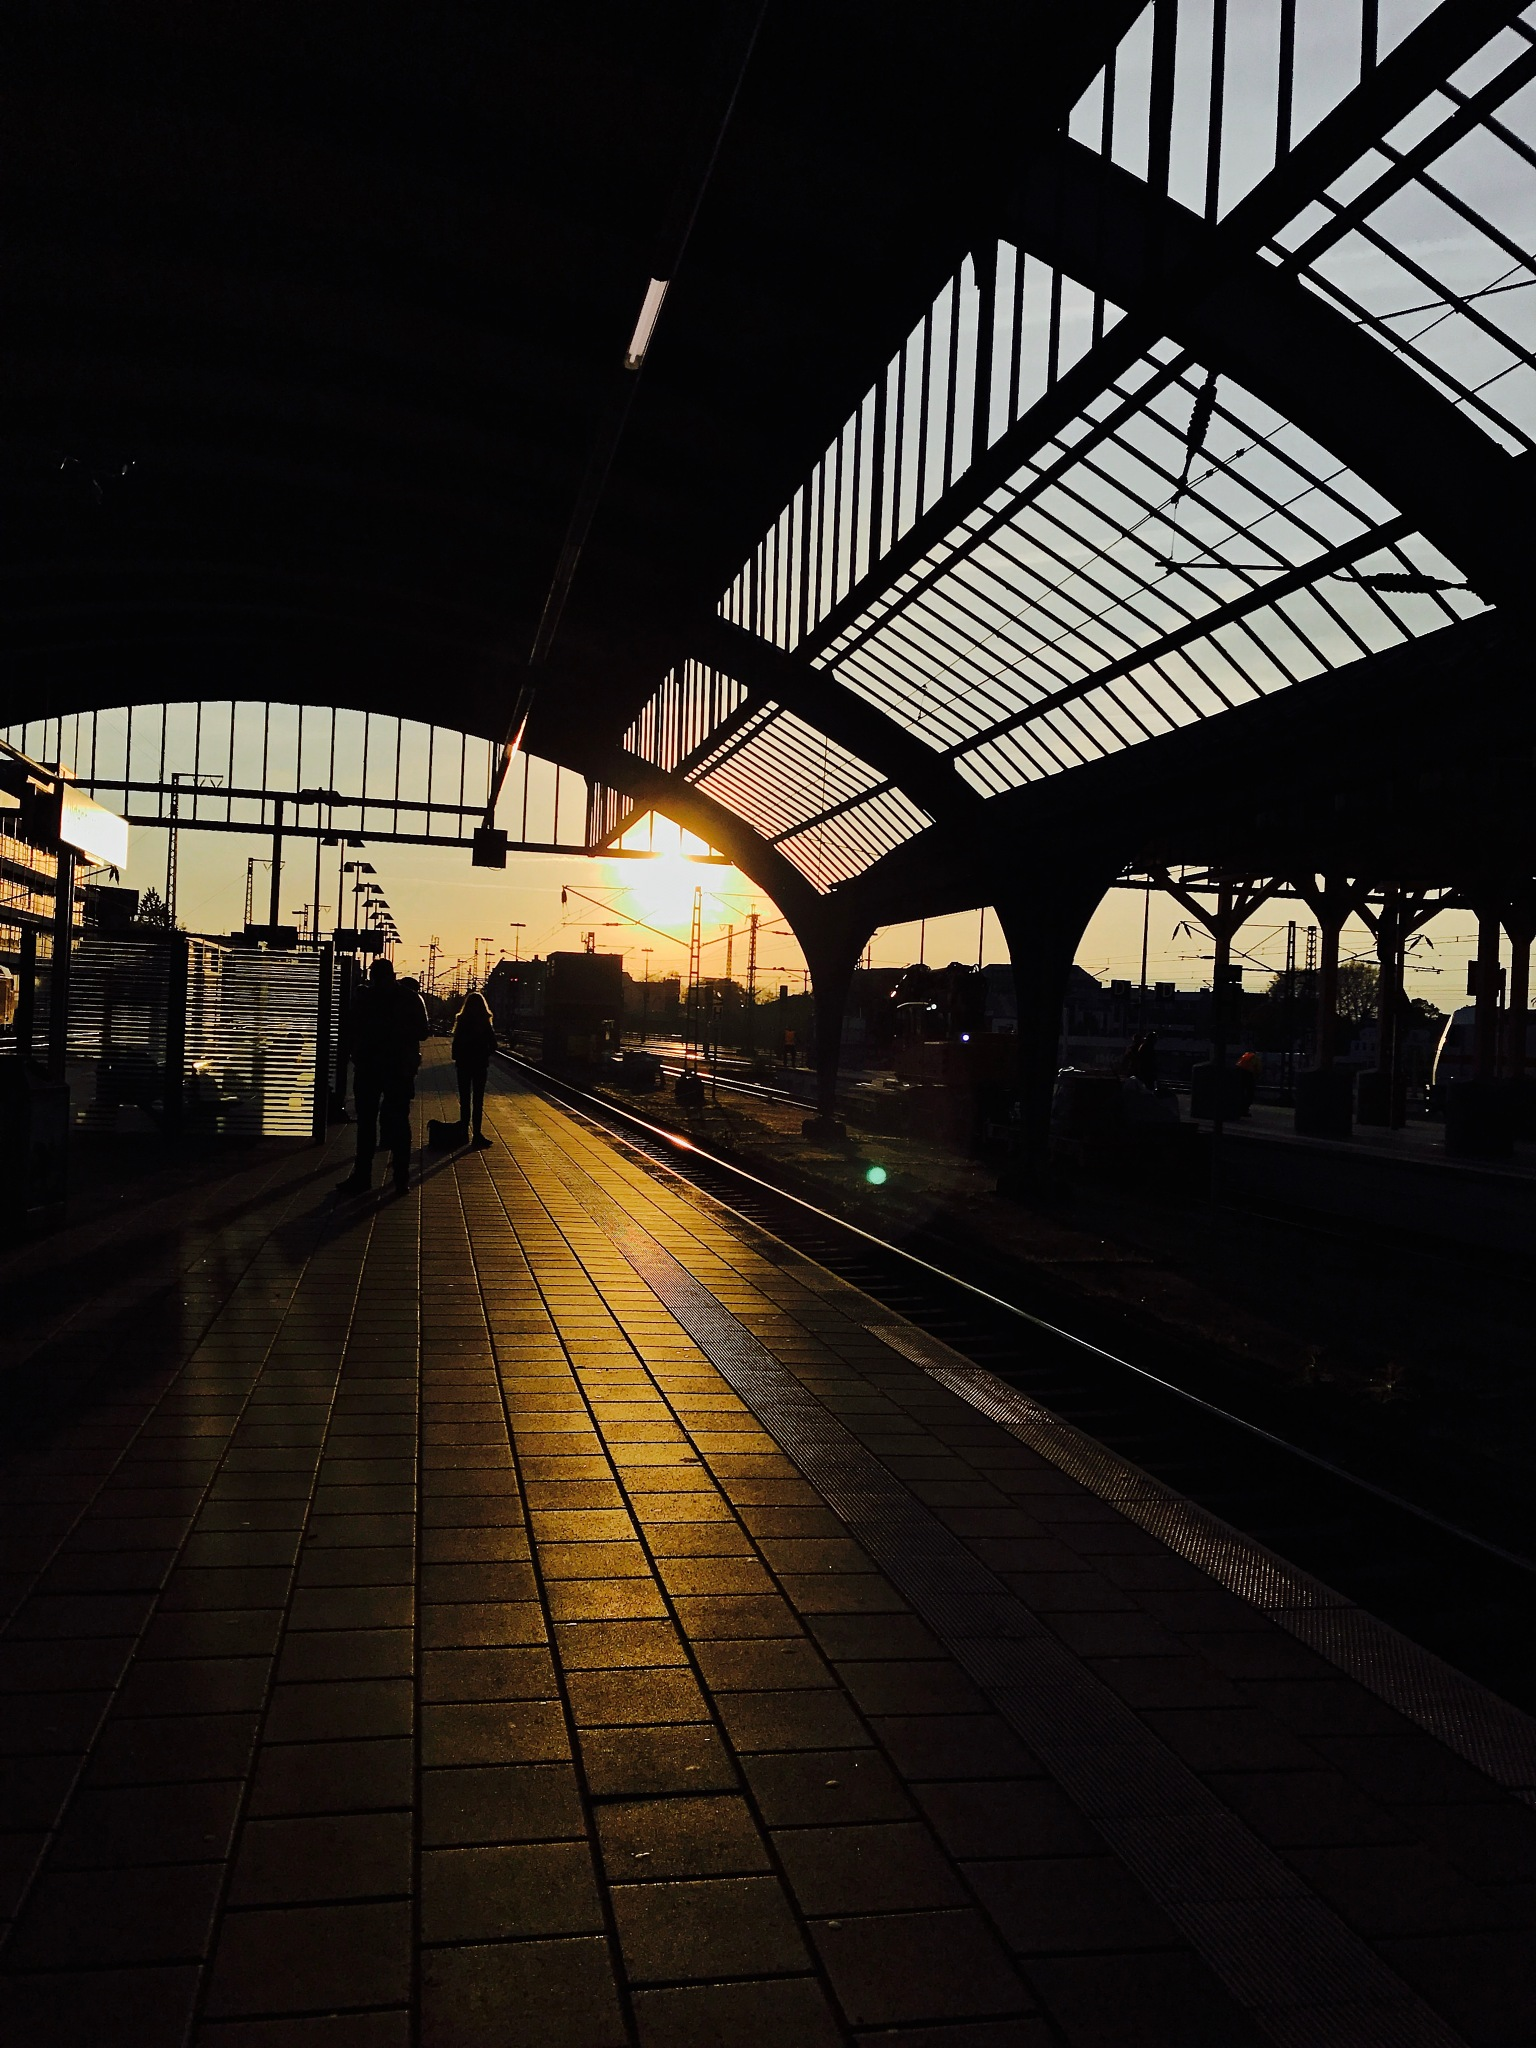 train station by Maya G.